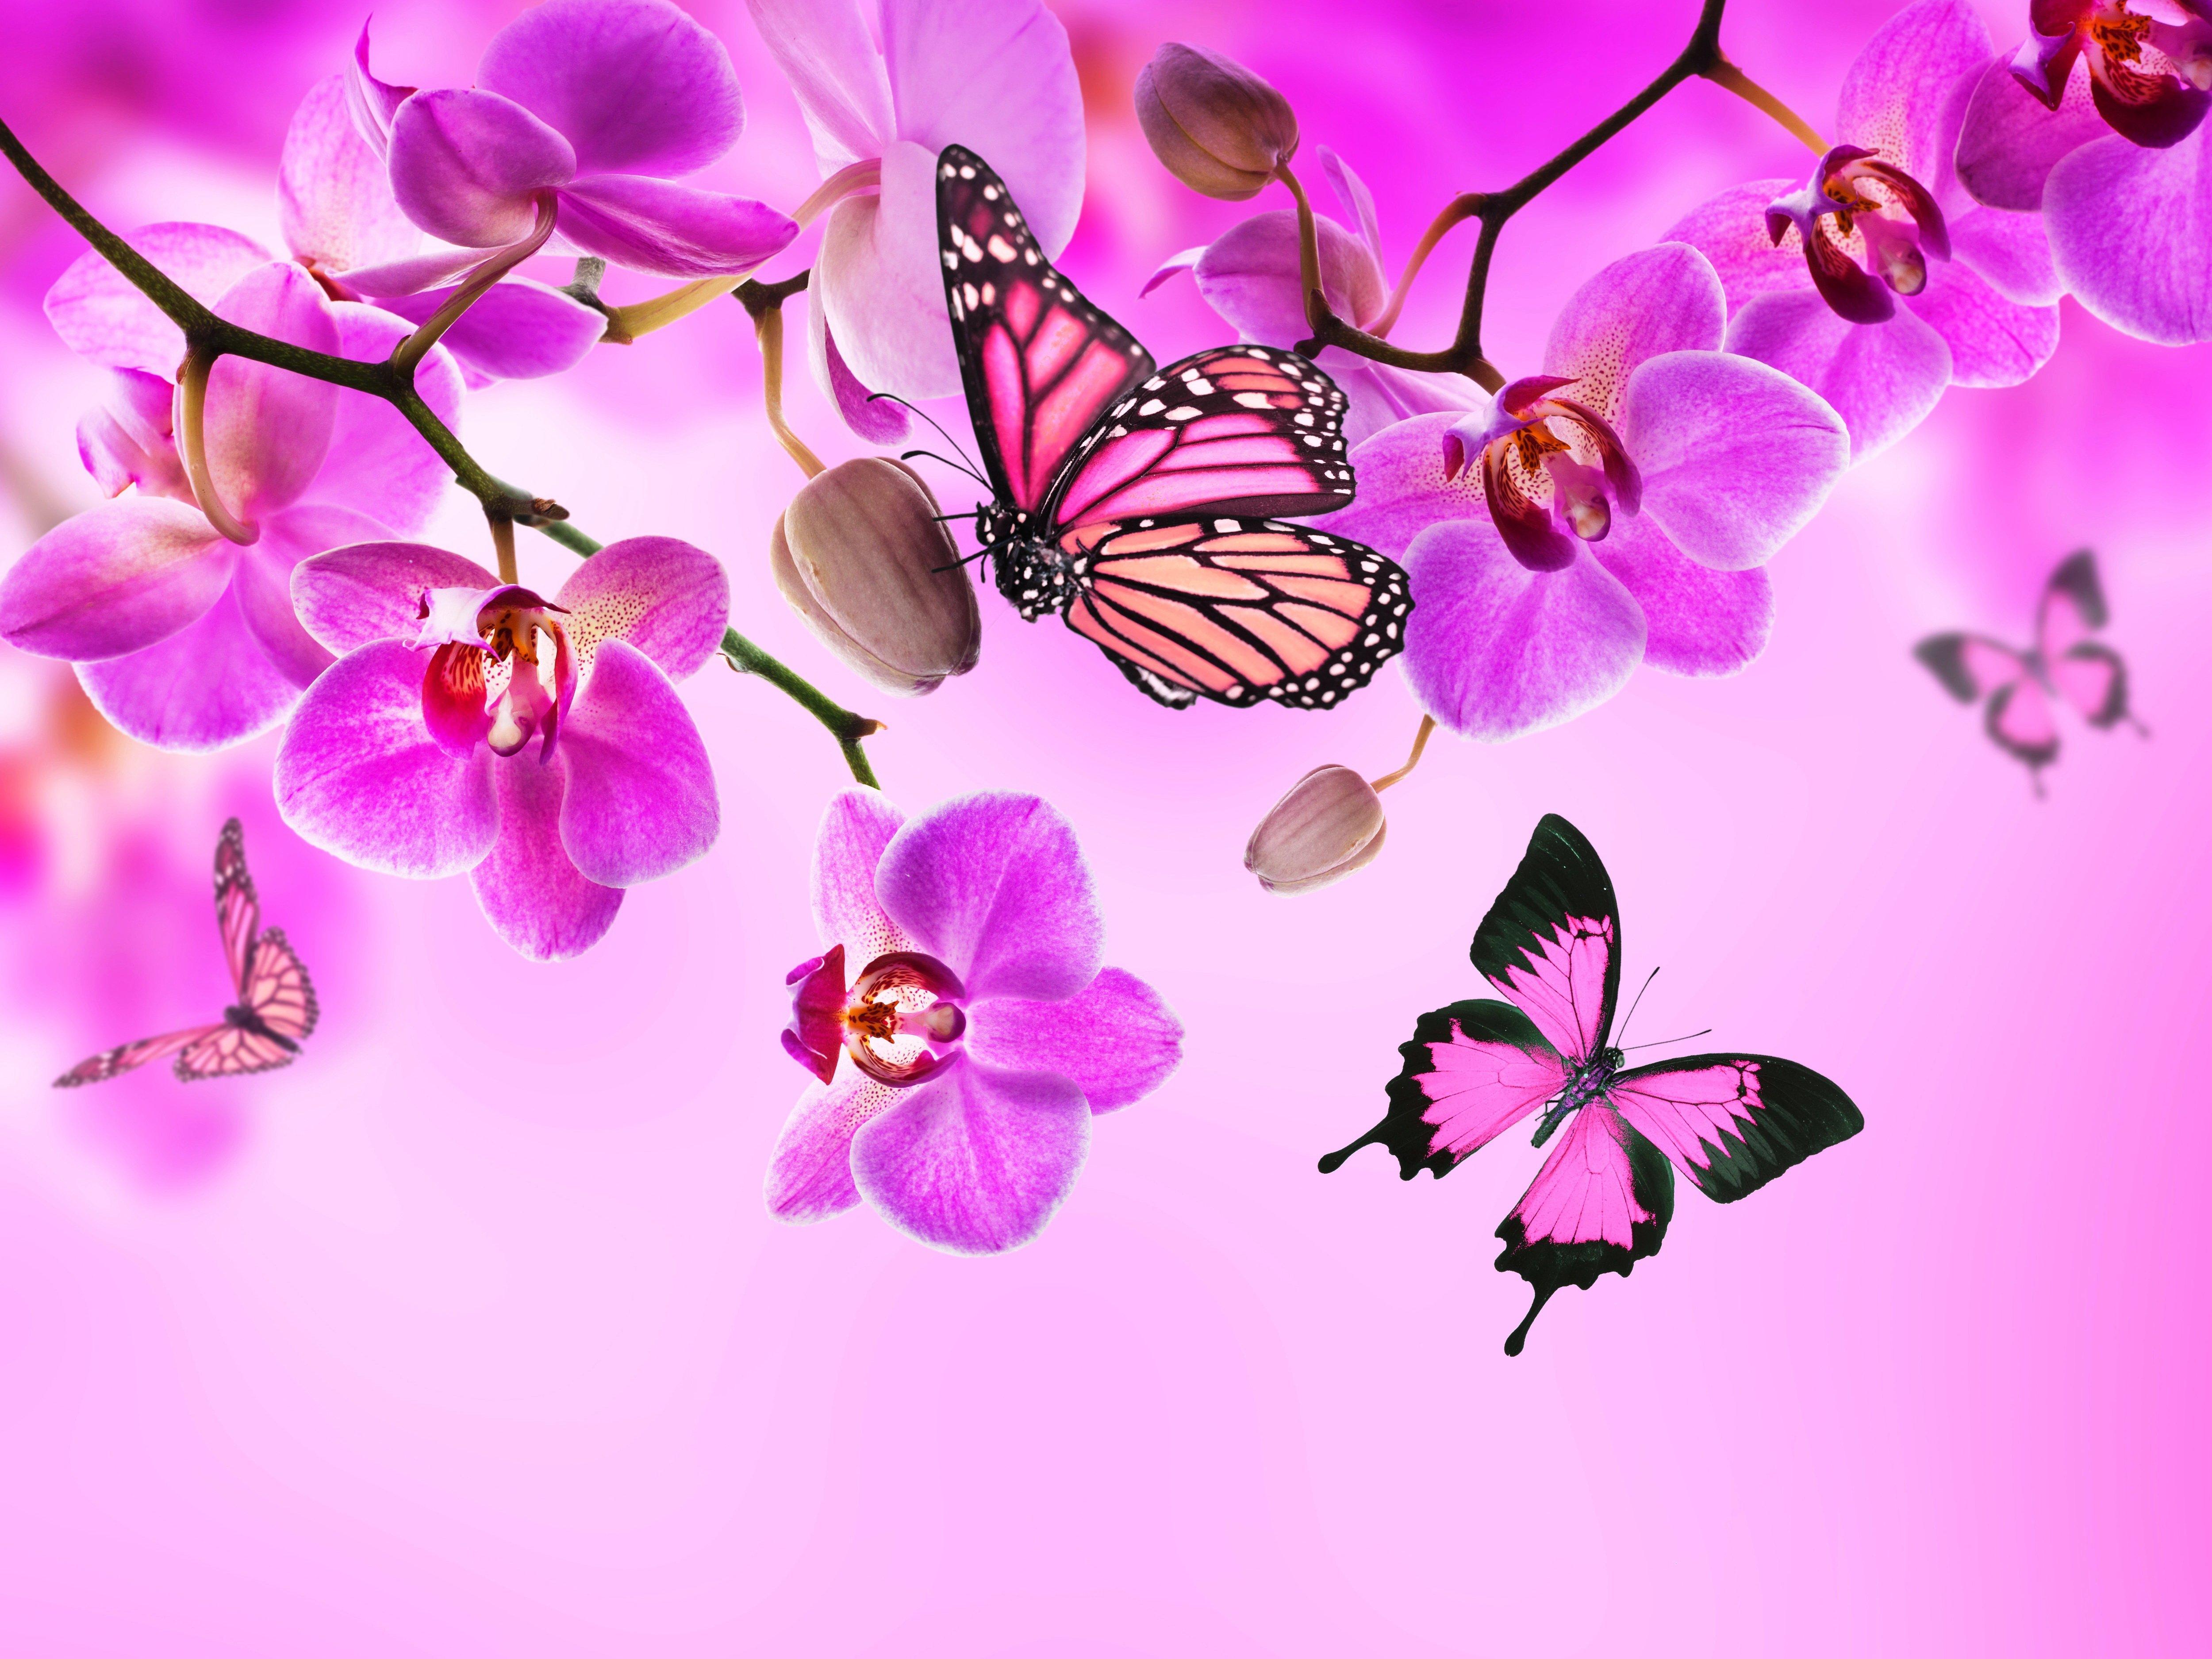 Orchid Butterflies Pink color Flowers wallpaper   5000x3750 ...